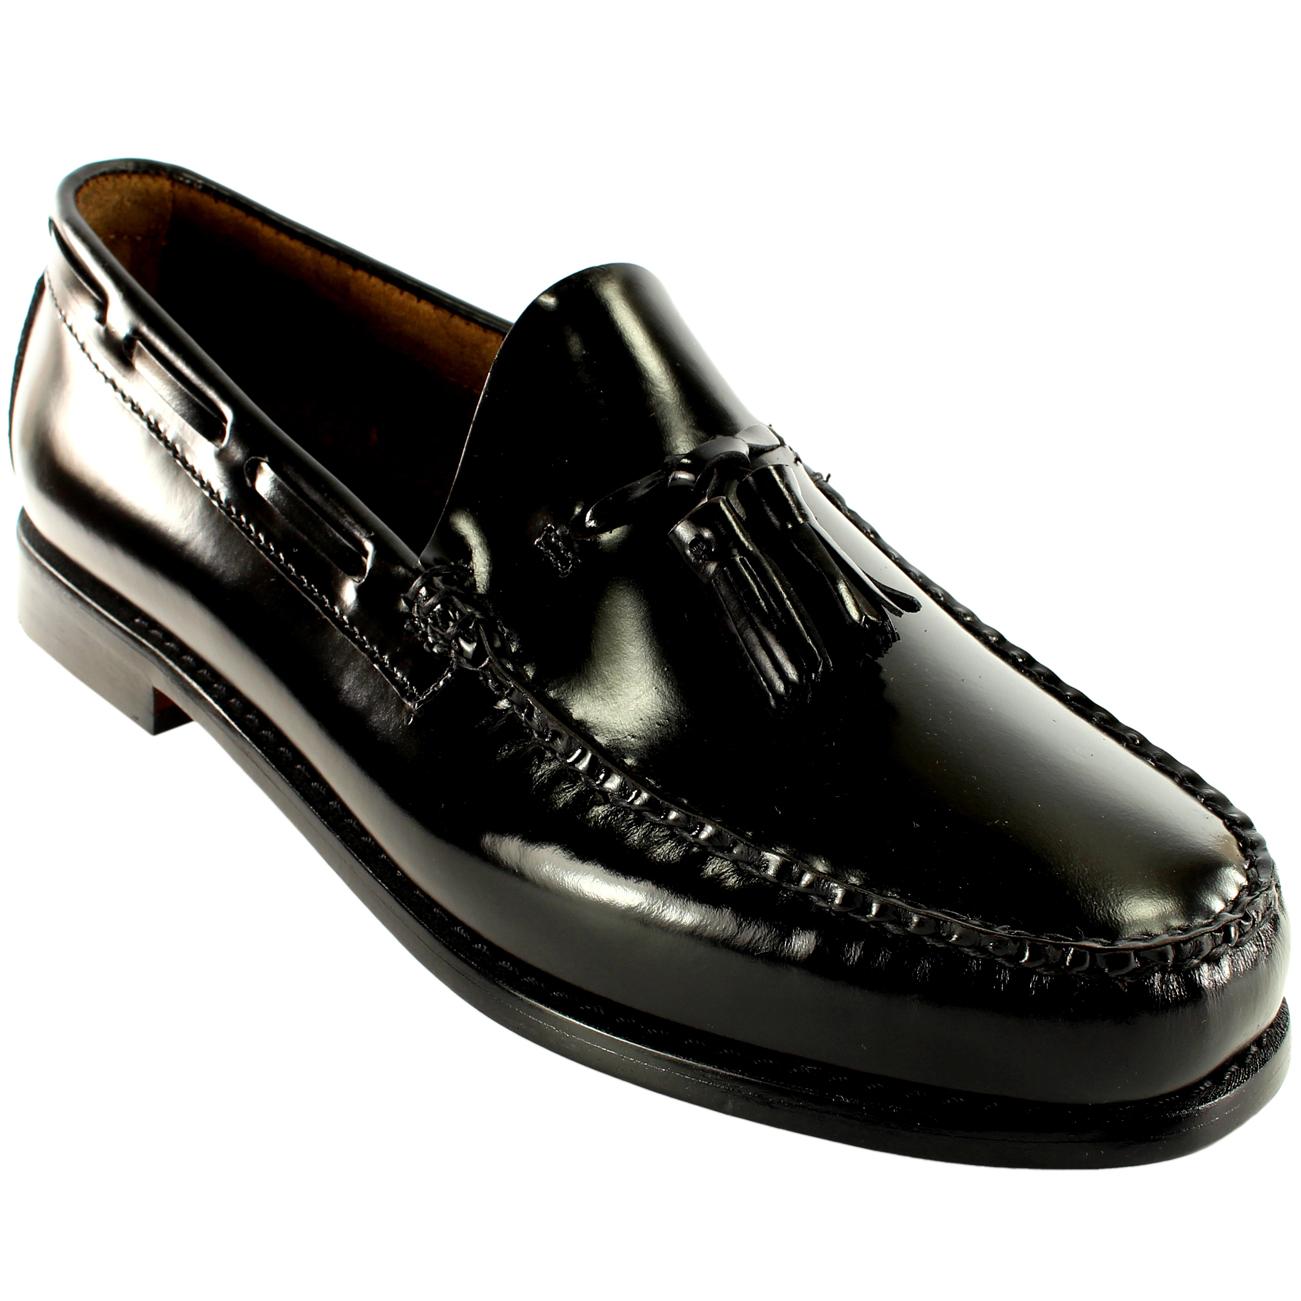 Mens Black Slip On Smart Shoes